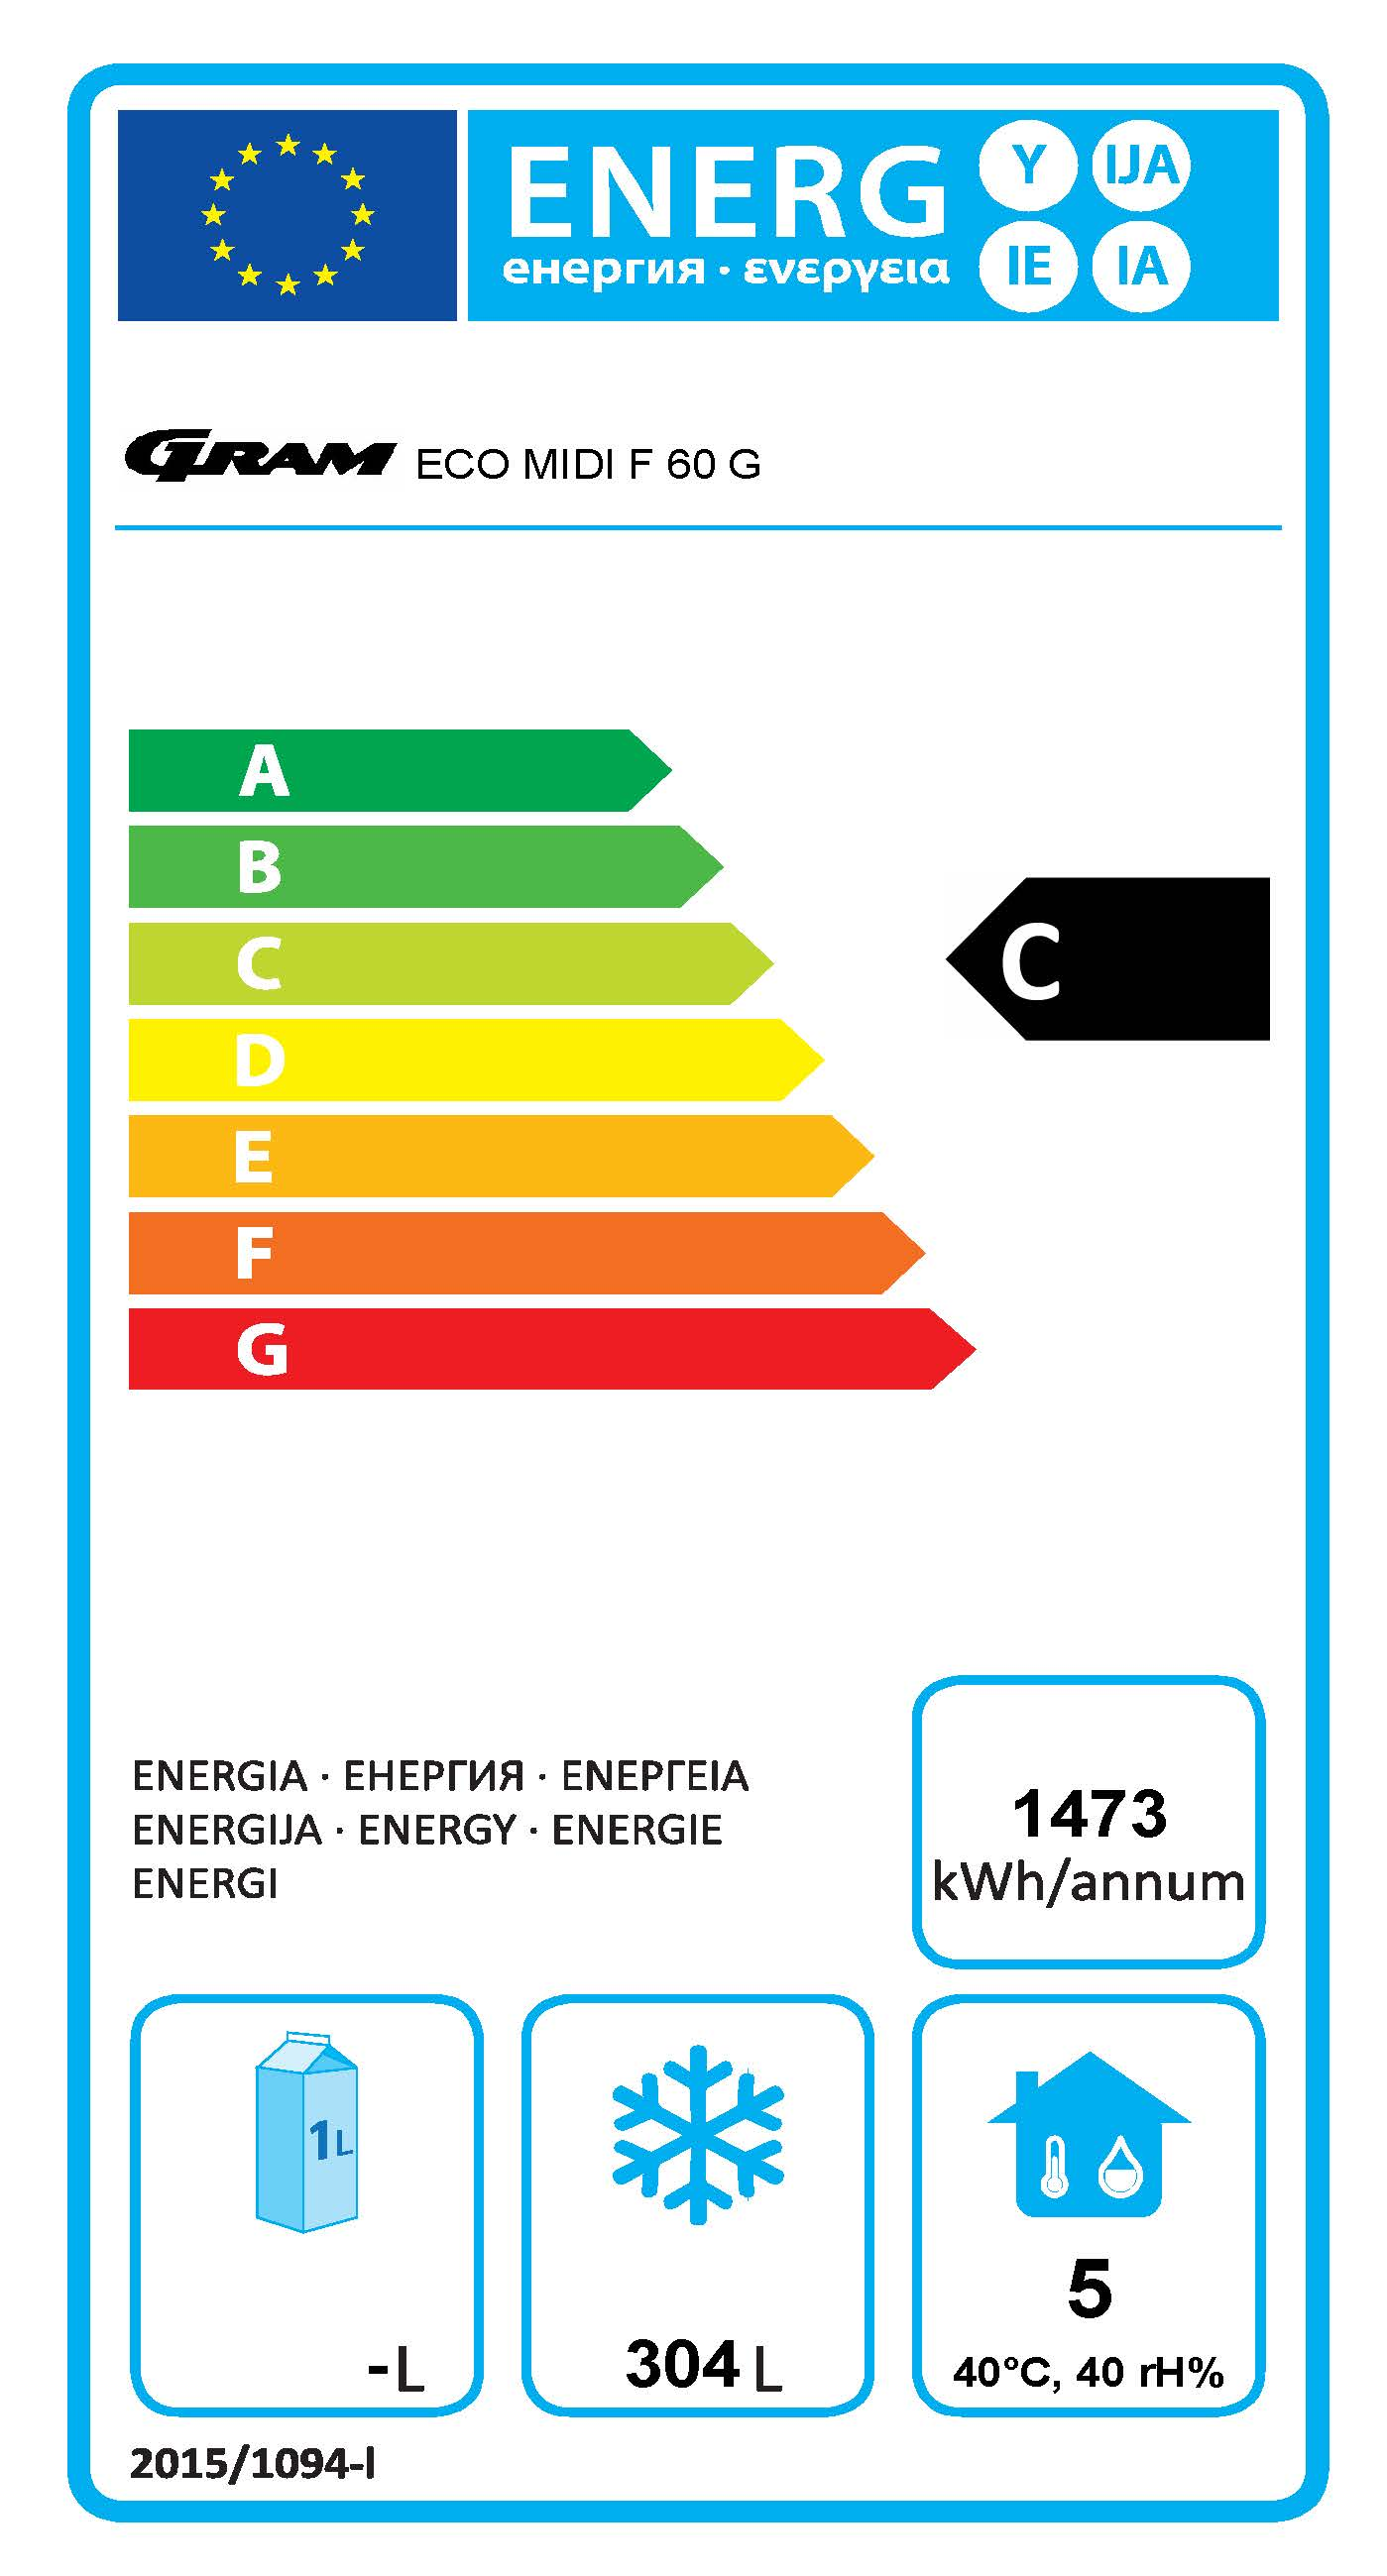 ECO MIDI F 60 CCG 4S 407 Ltr Upright Freezer Energy Rating